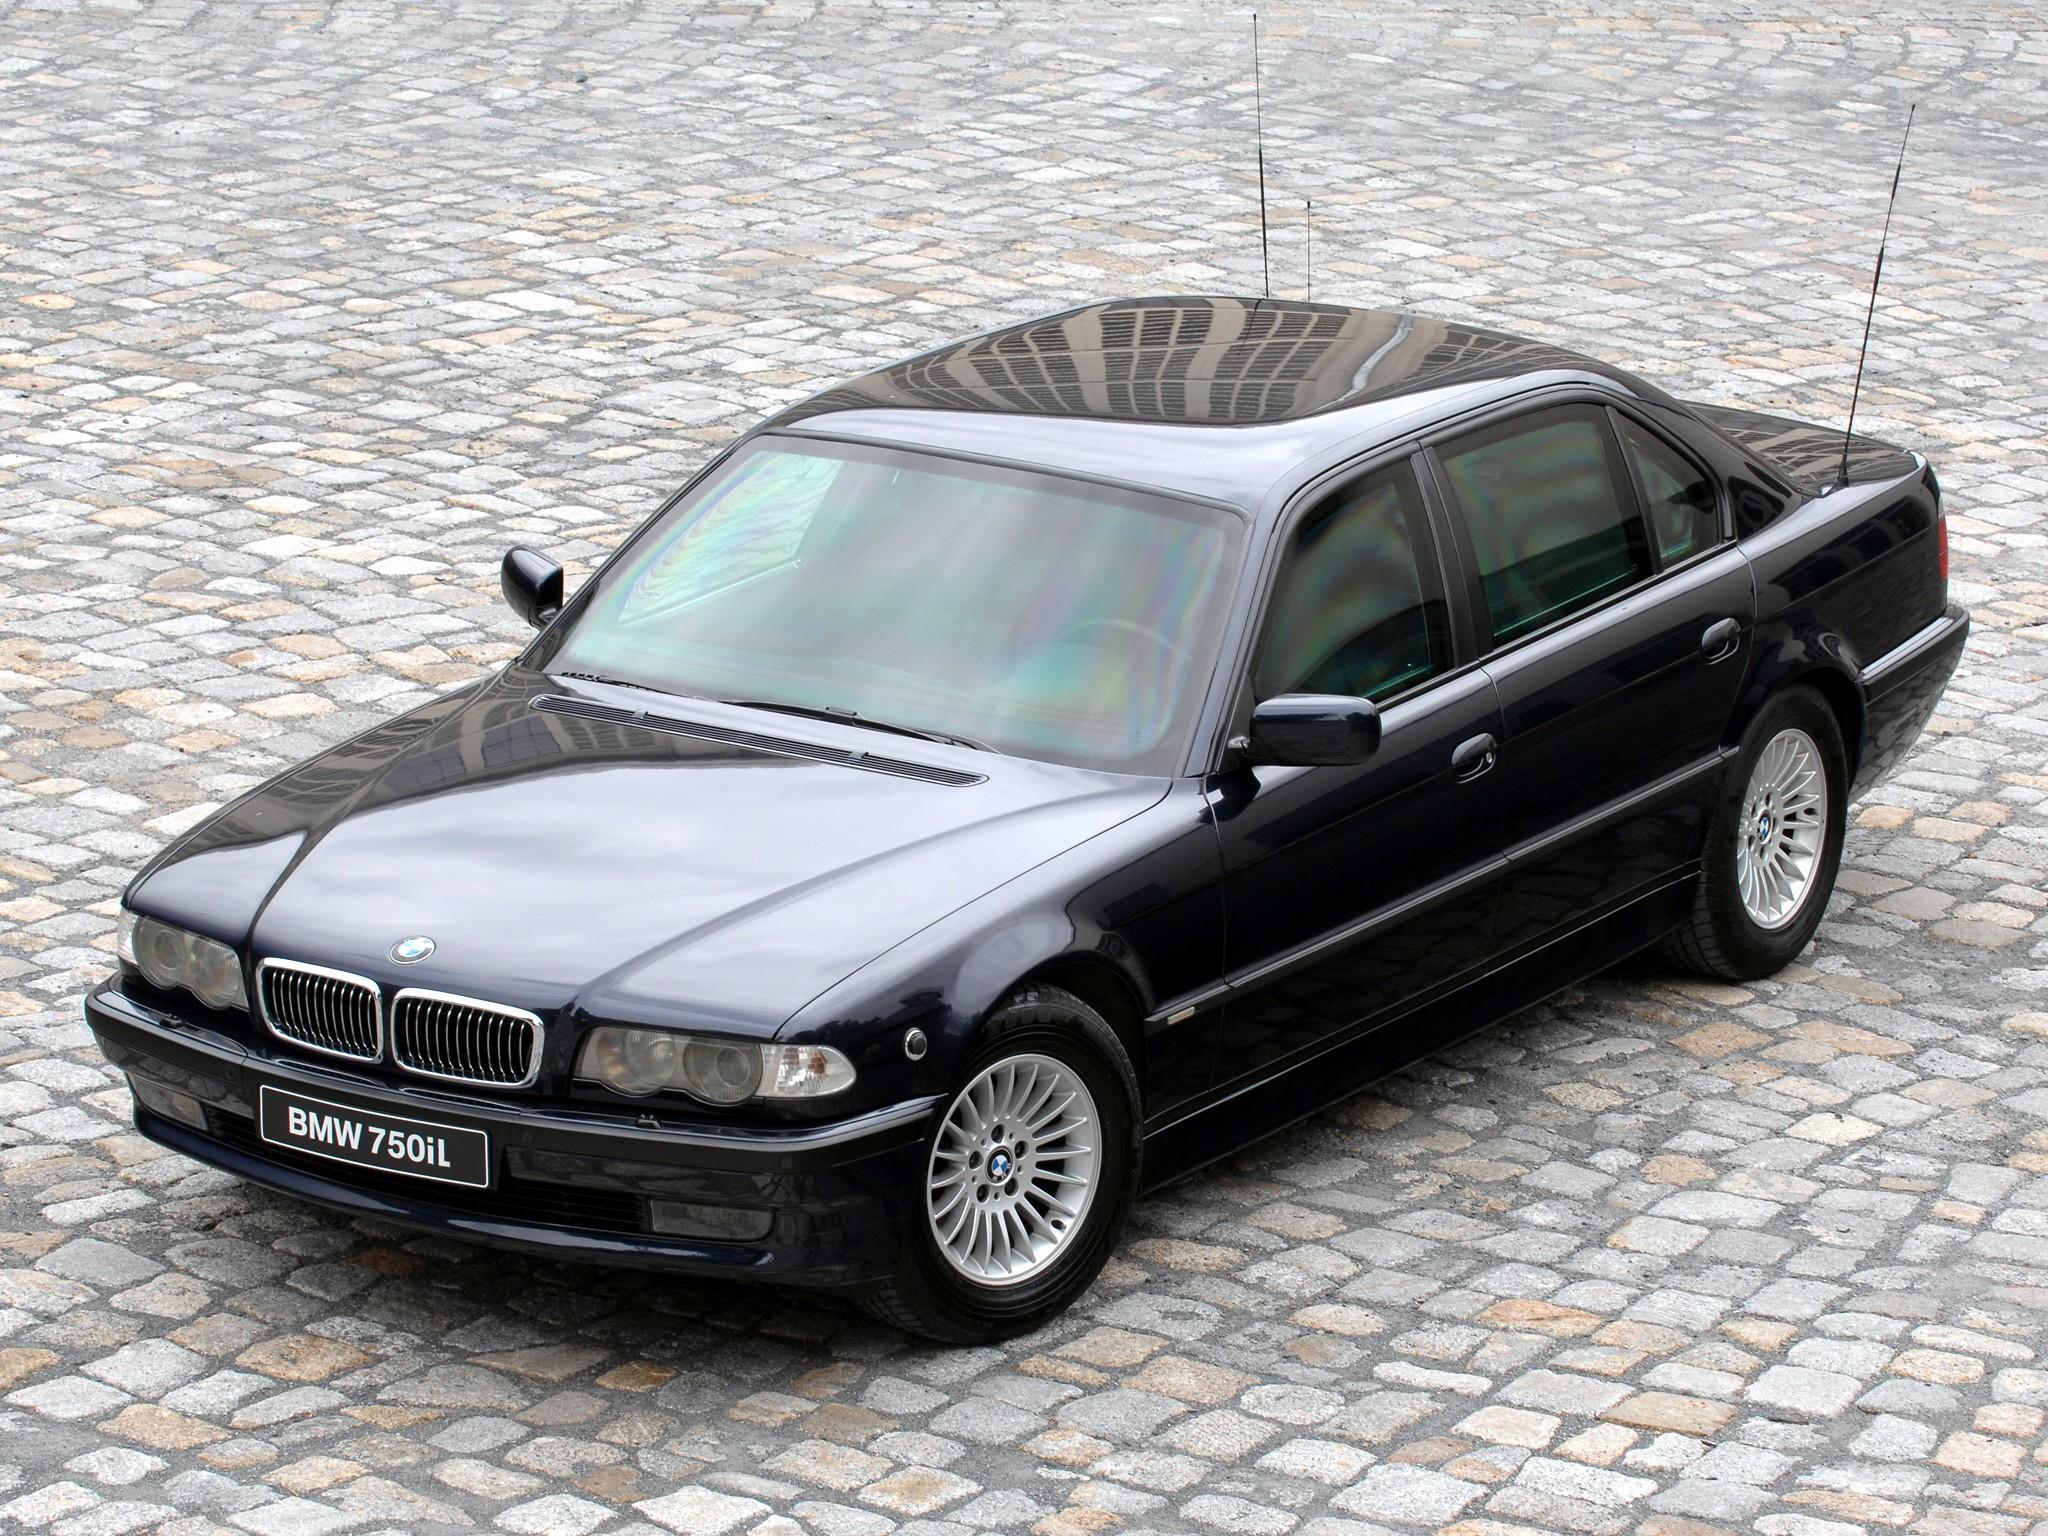 bmw 7 series e38 specs 1998 1999 2000 2001 autoevolution. Black Bedroom Furniture Sets. Home Design Ideas